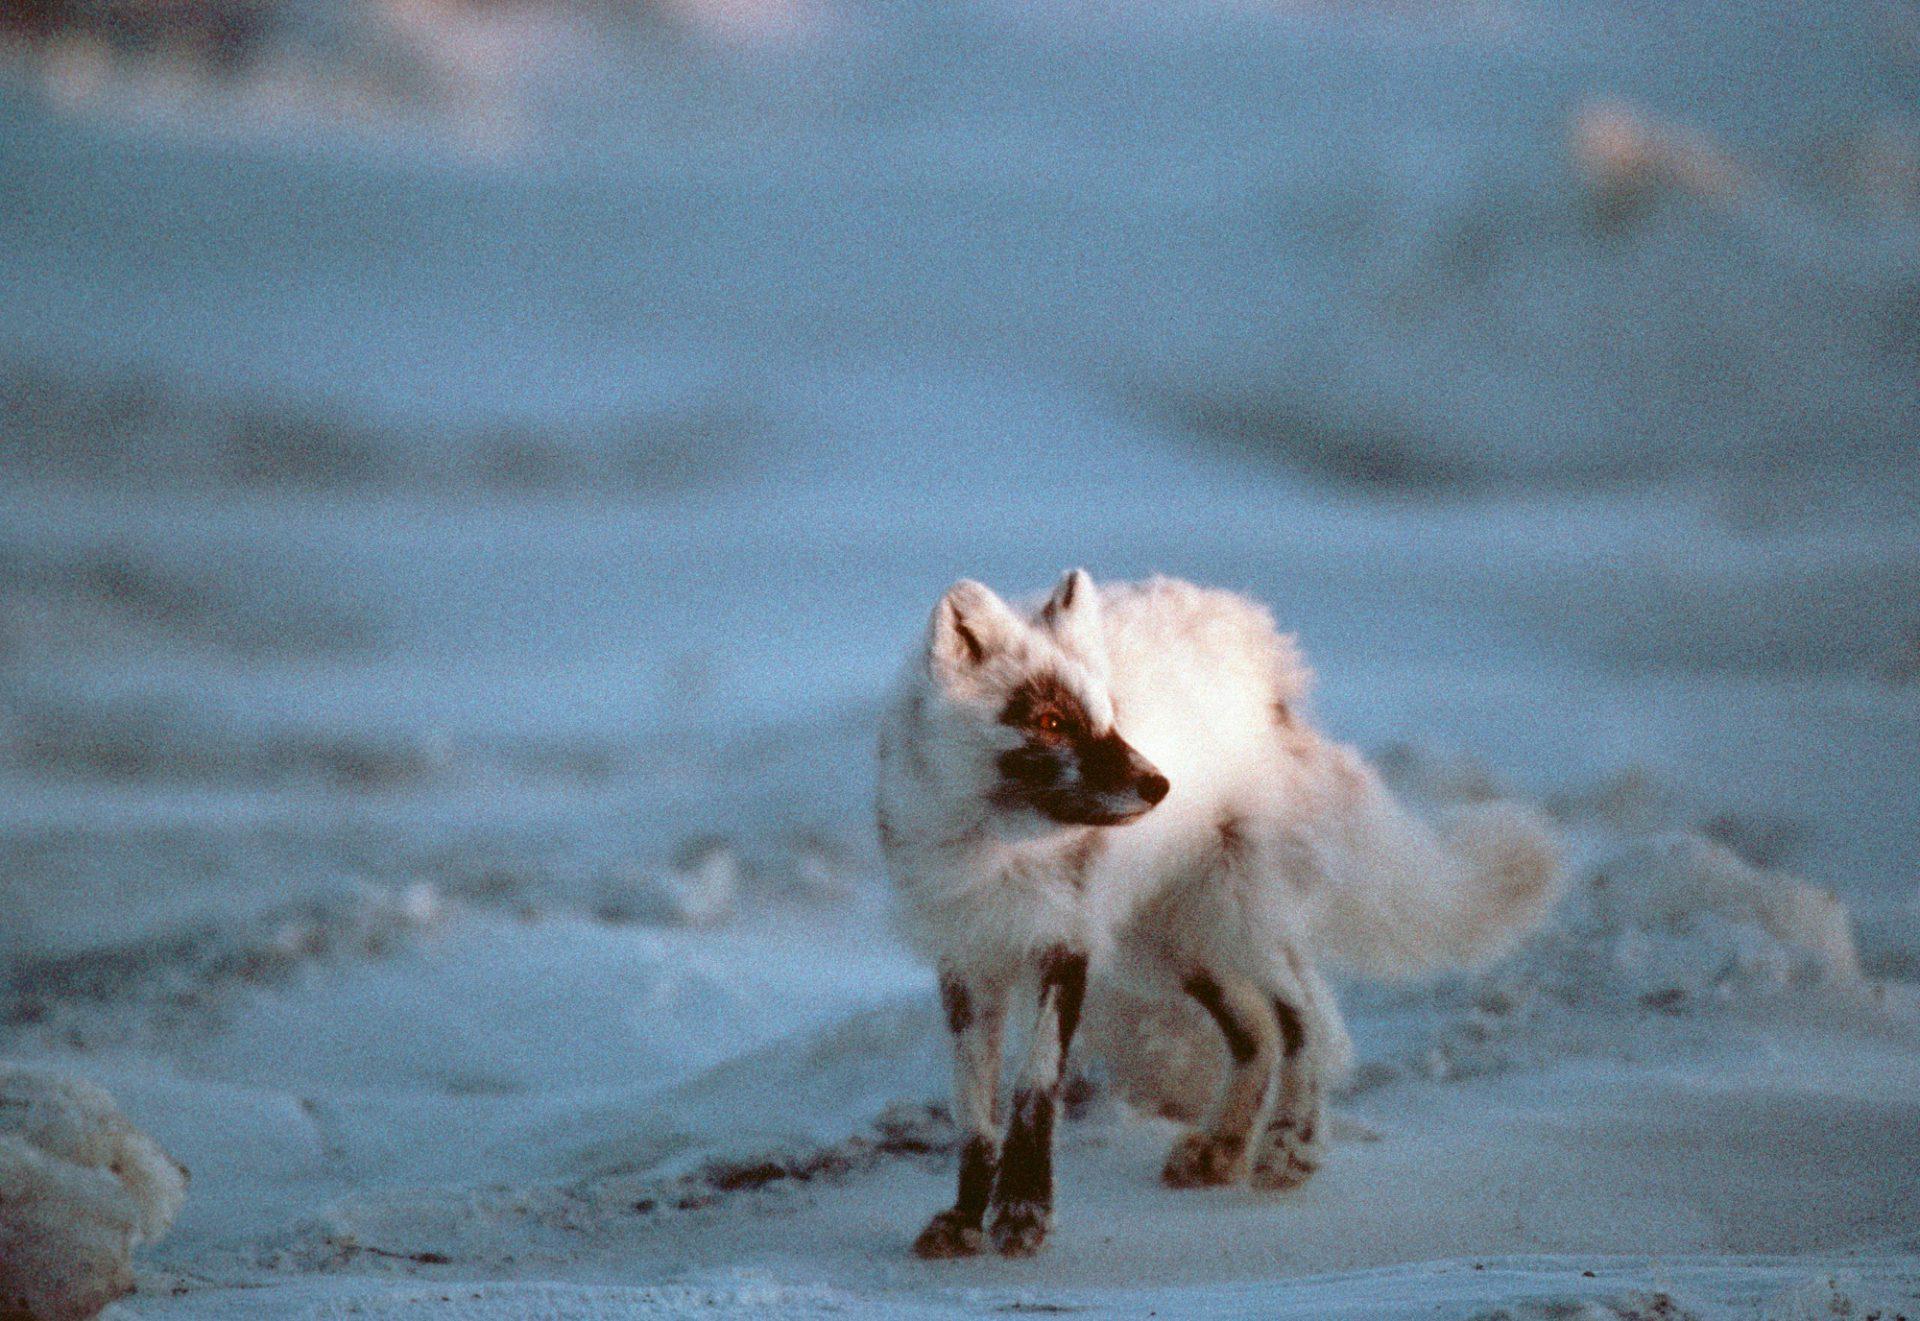 Photo: An Arctic fox (Alopex lagopus) in Prudhoe Bay, Alaska.